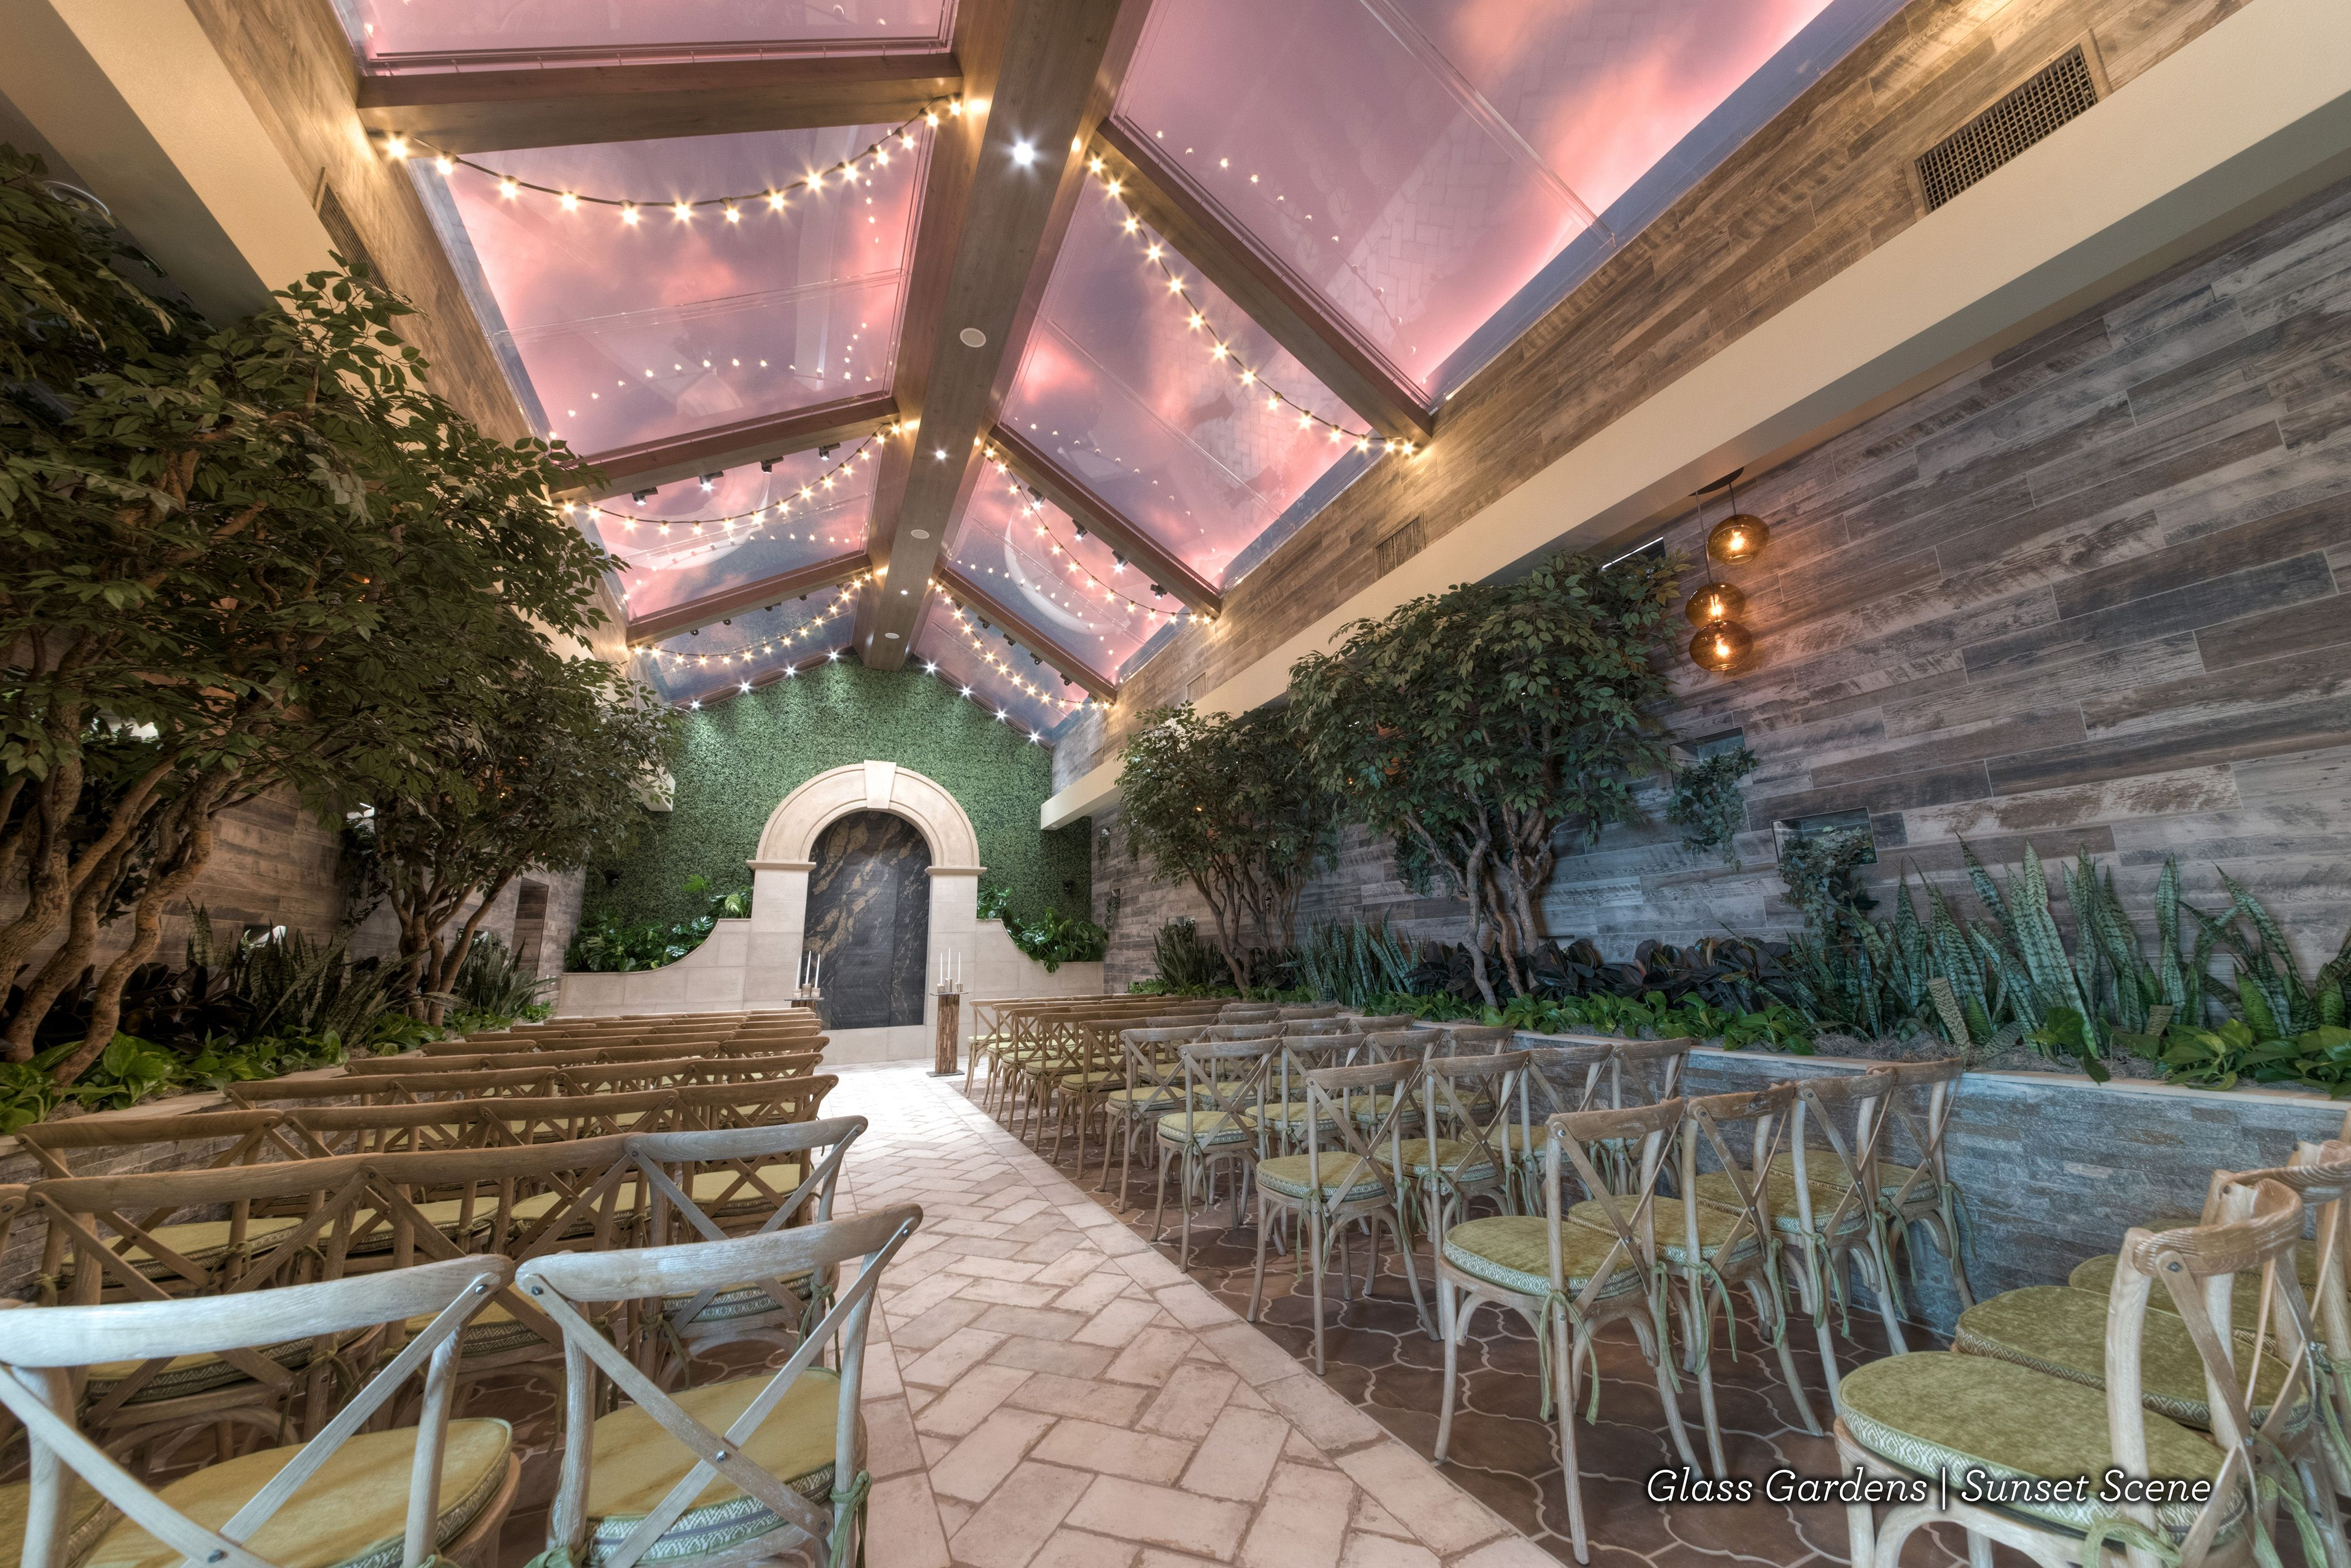 Romantic Sunset Wedding Ideas Indoor Garden Wedding Venue Best Vegas Wedding Venue Las Vegas Wedding Venue Las Vegas Weddings Vegas Wedding